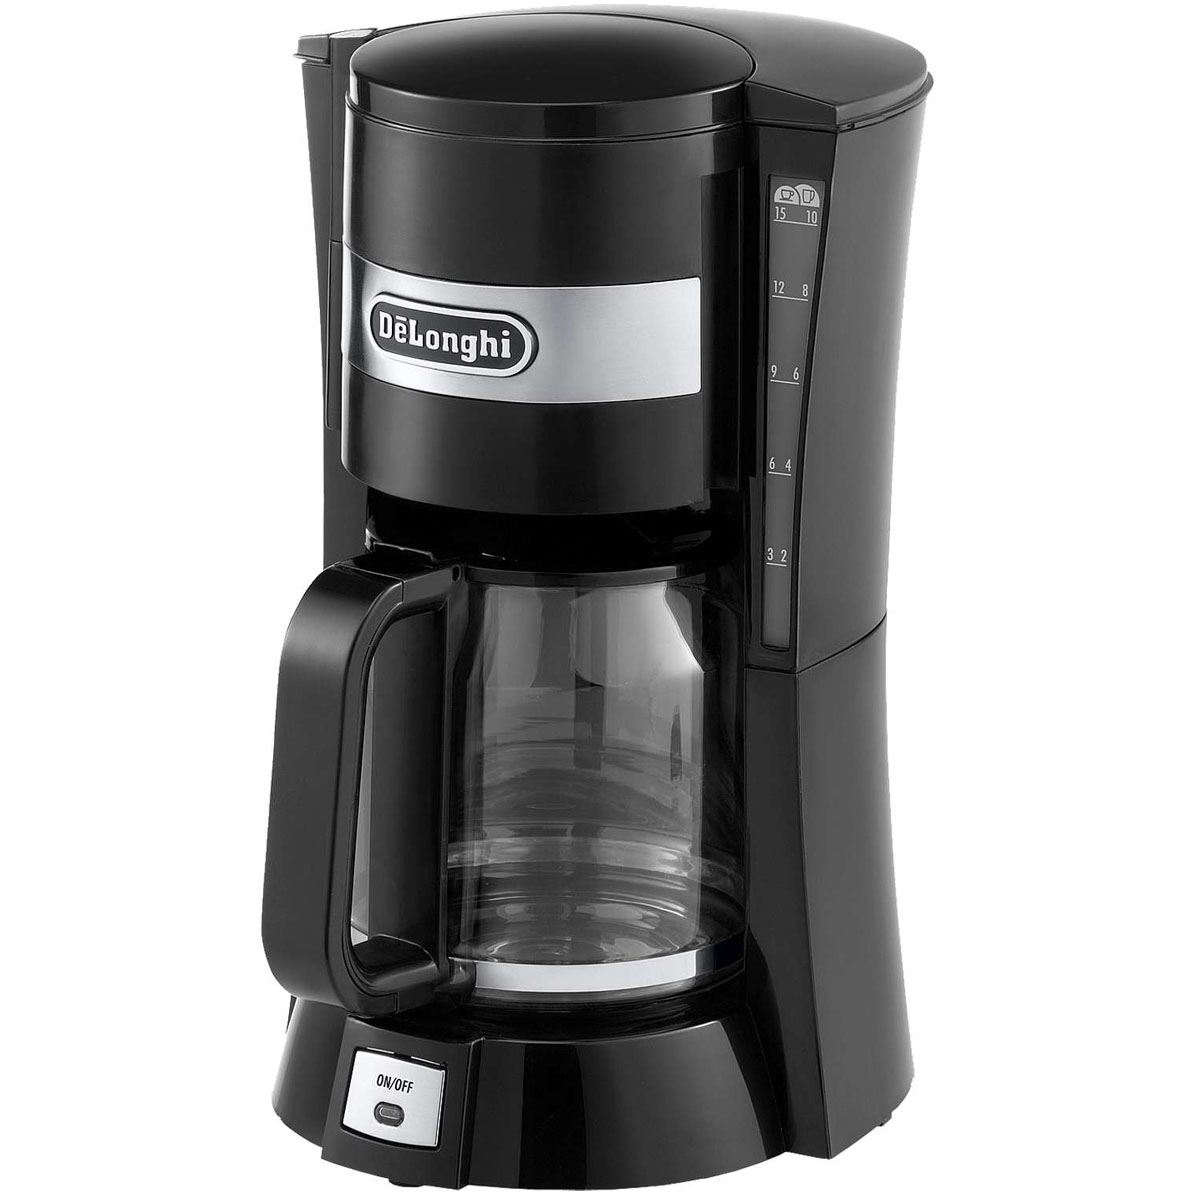 Delonghi One Cup Coffee Maker : Delonghi ICM15210 Black 10 Cup 1.3L 900W Filter Coffee Maker Machine New 8004399327023 eBay